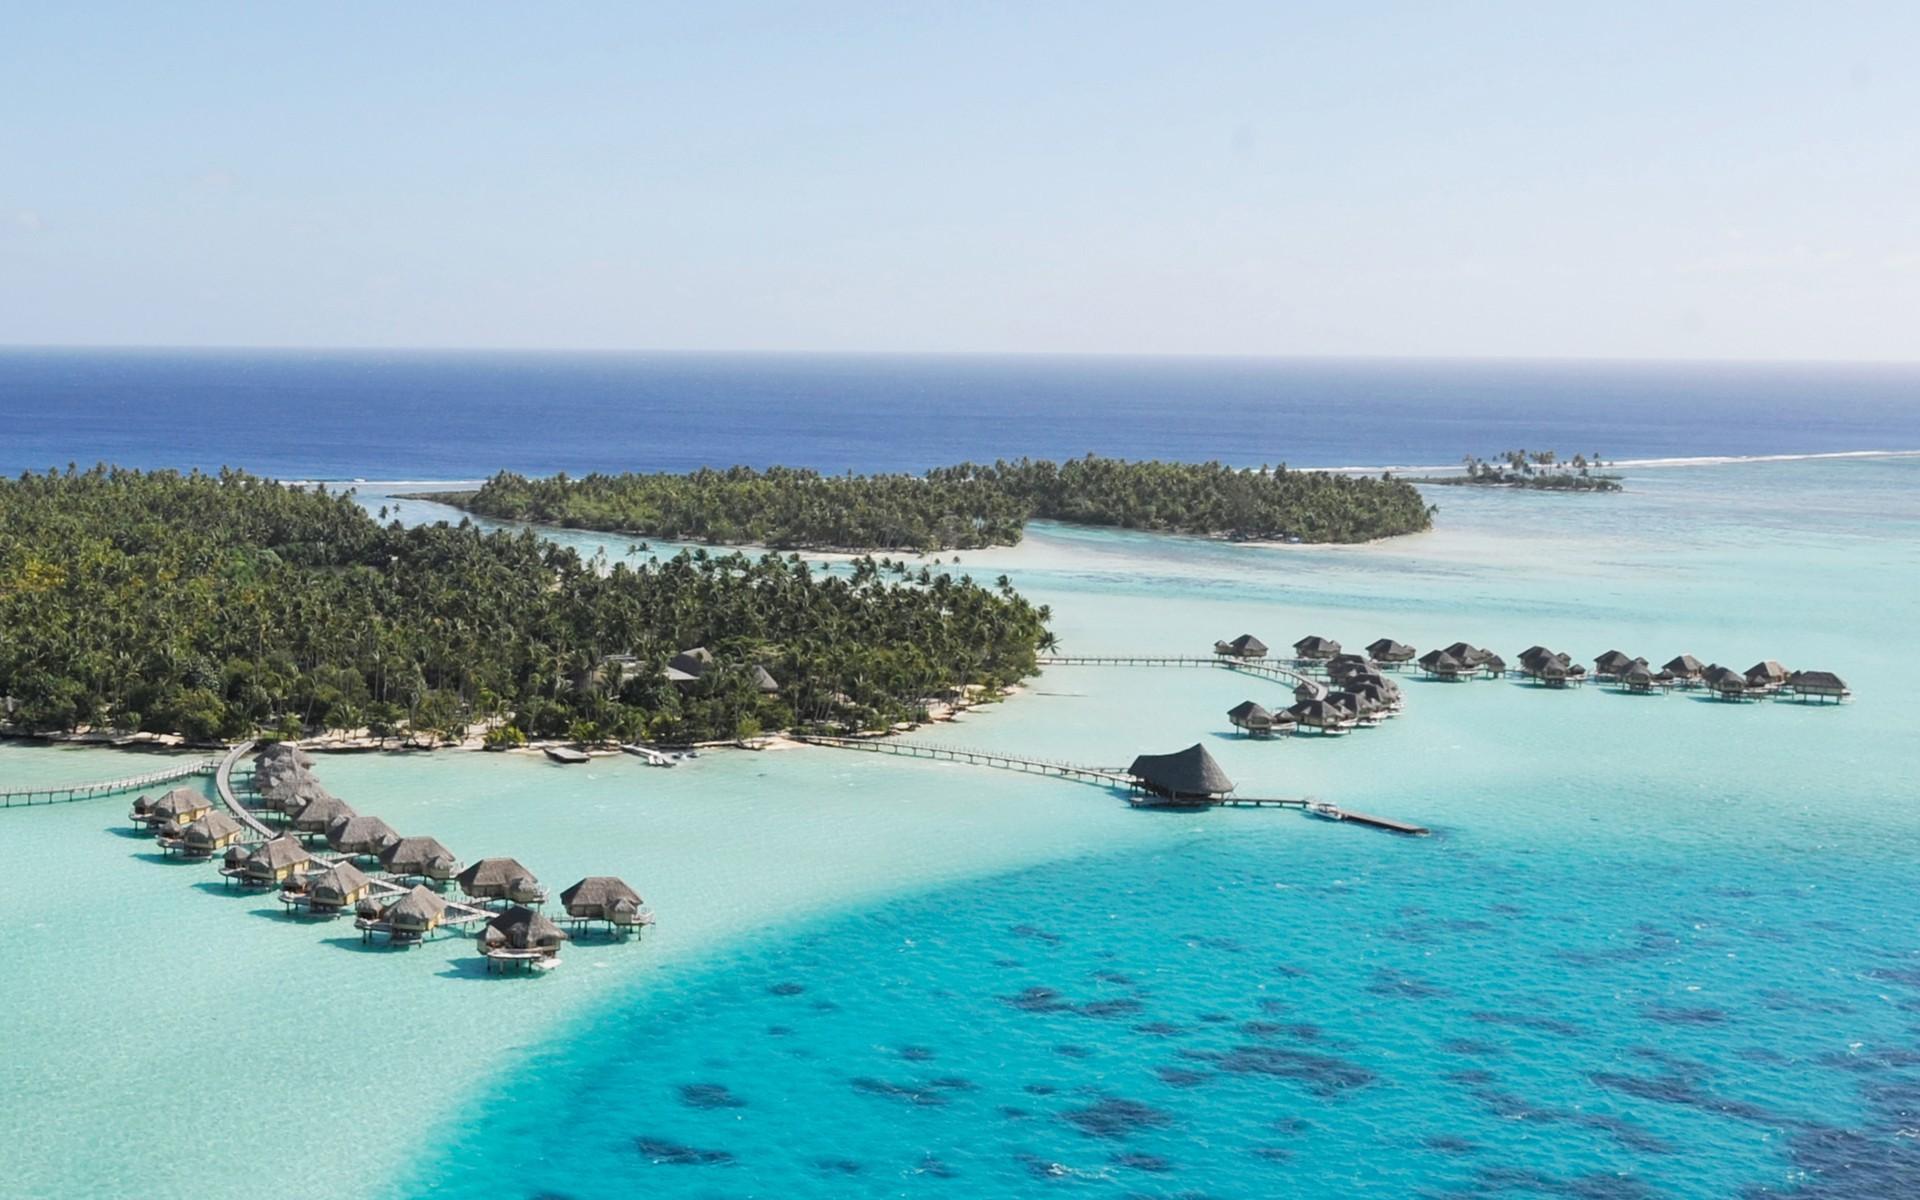 Le Taha a Island Resort & Spa Hotel di lusso e Ristorante gourmet sul mare Patio Taha a – Relais & Ch¢teaux